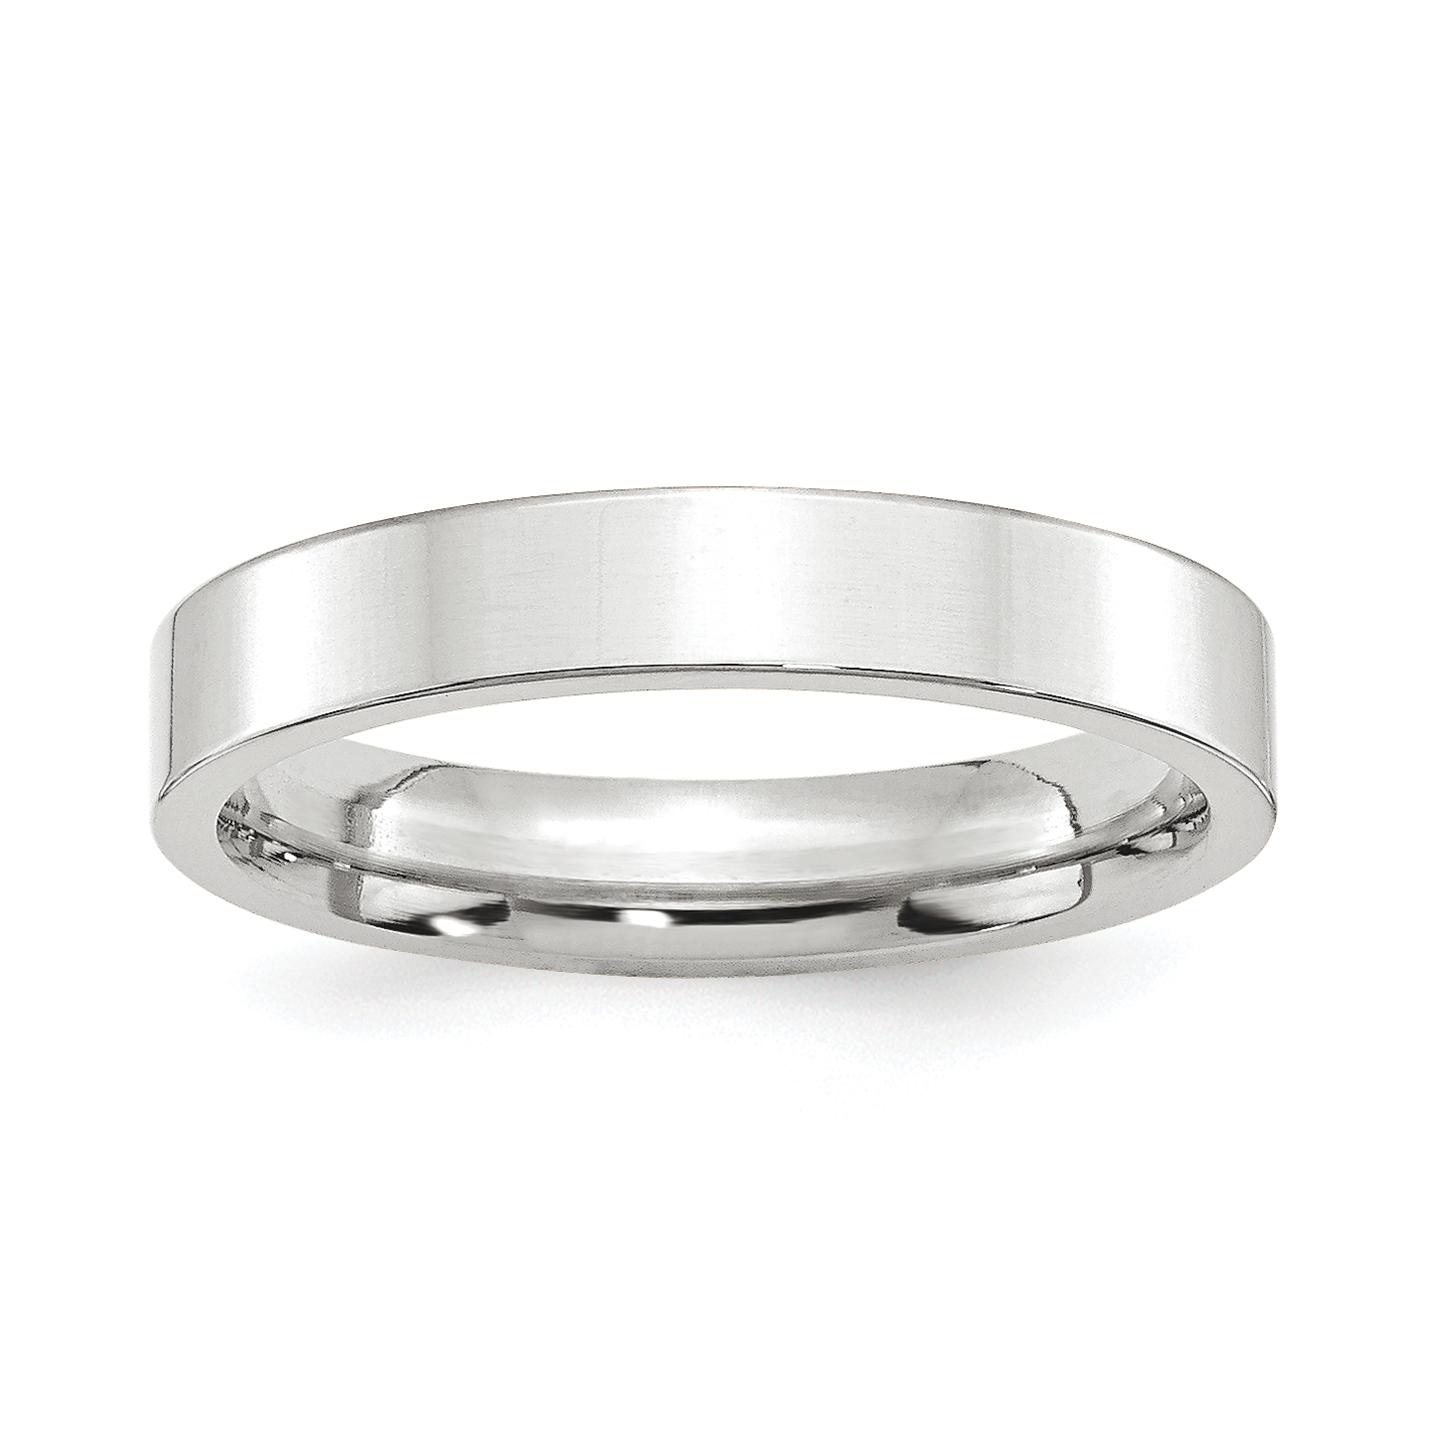 Platinum 4mm Wedding Band: Platinum 4mm Flat Size 9 Wedding Ring Band Classic Comfort